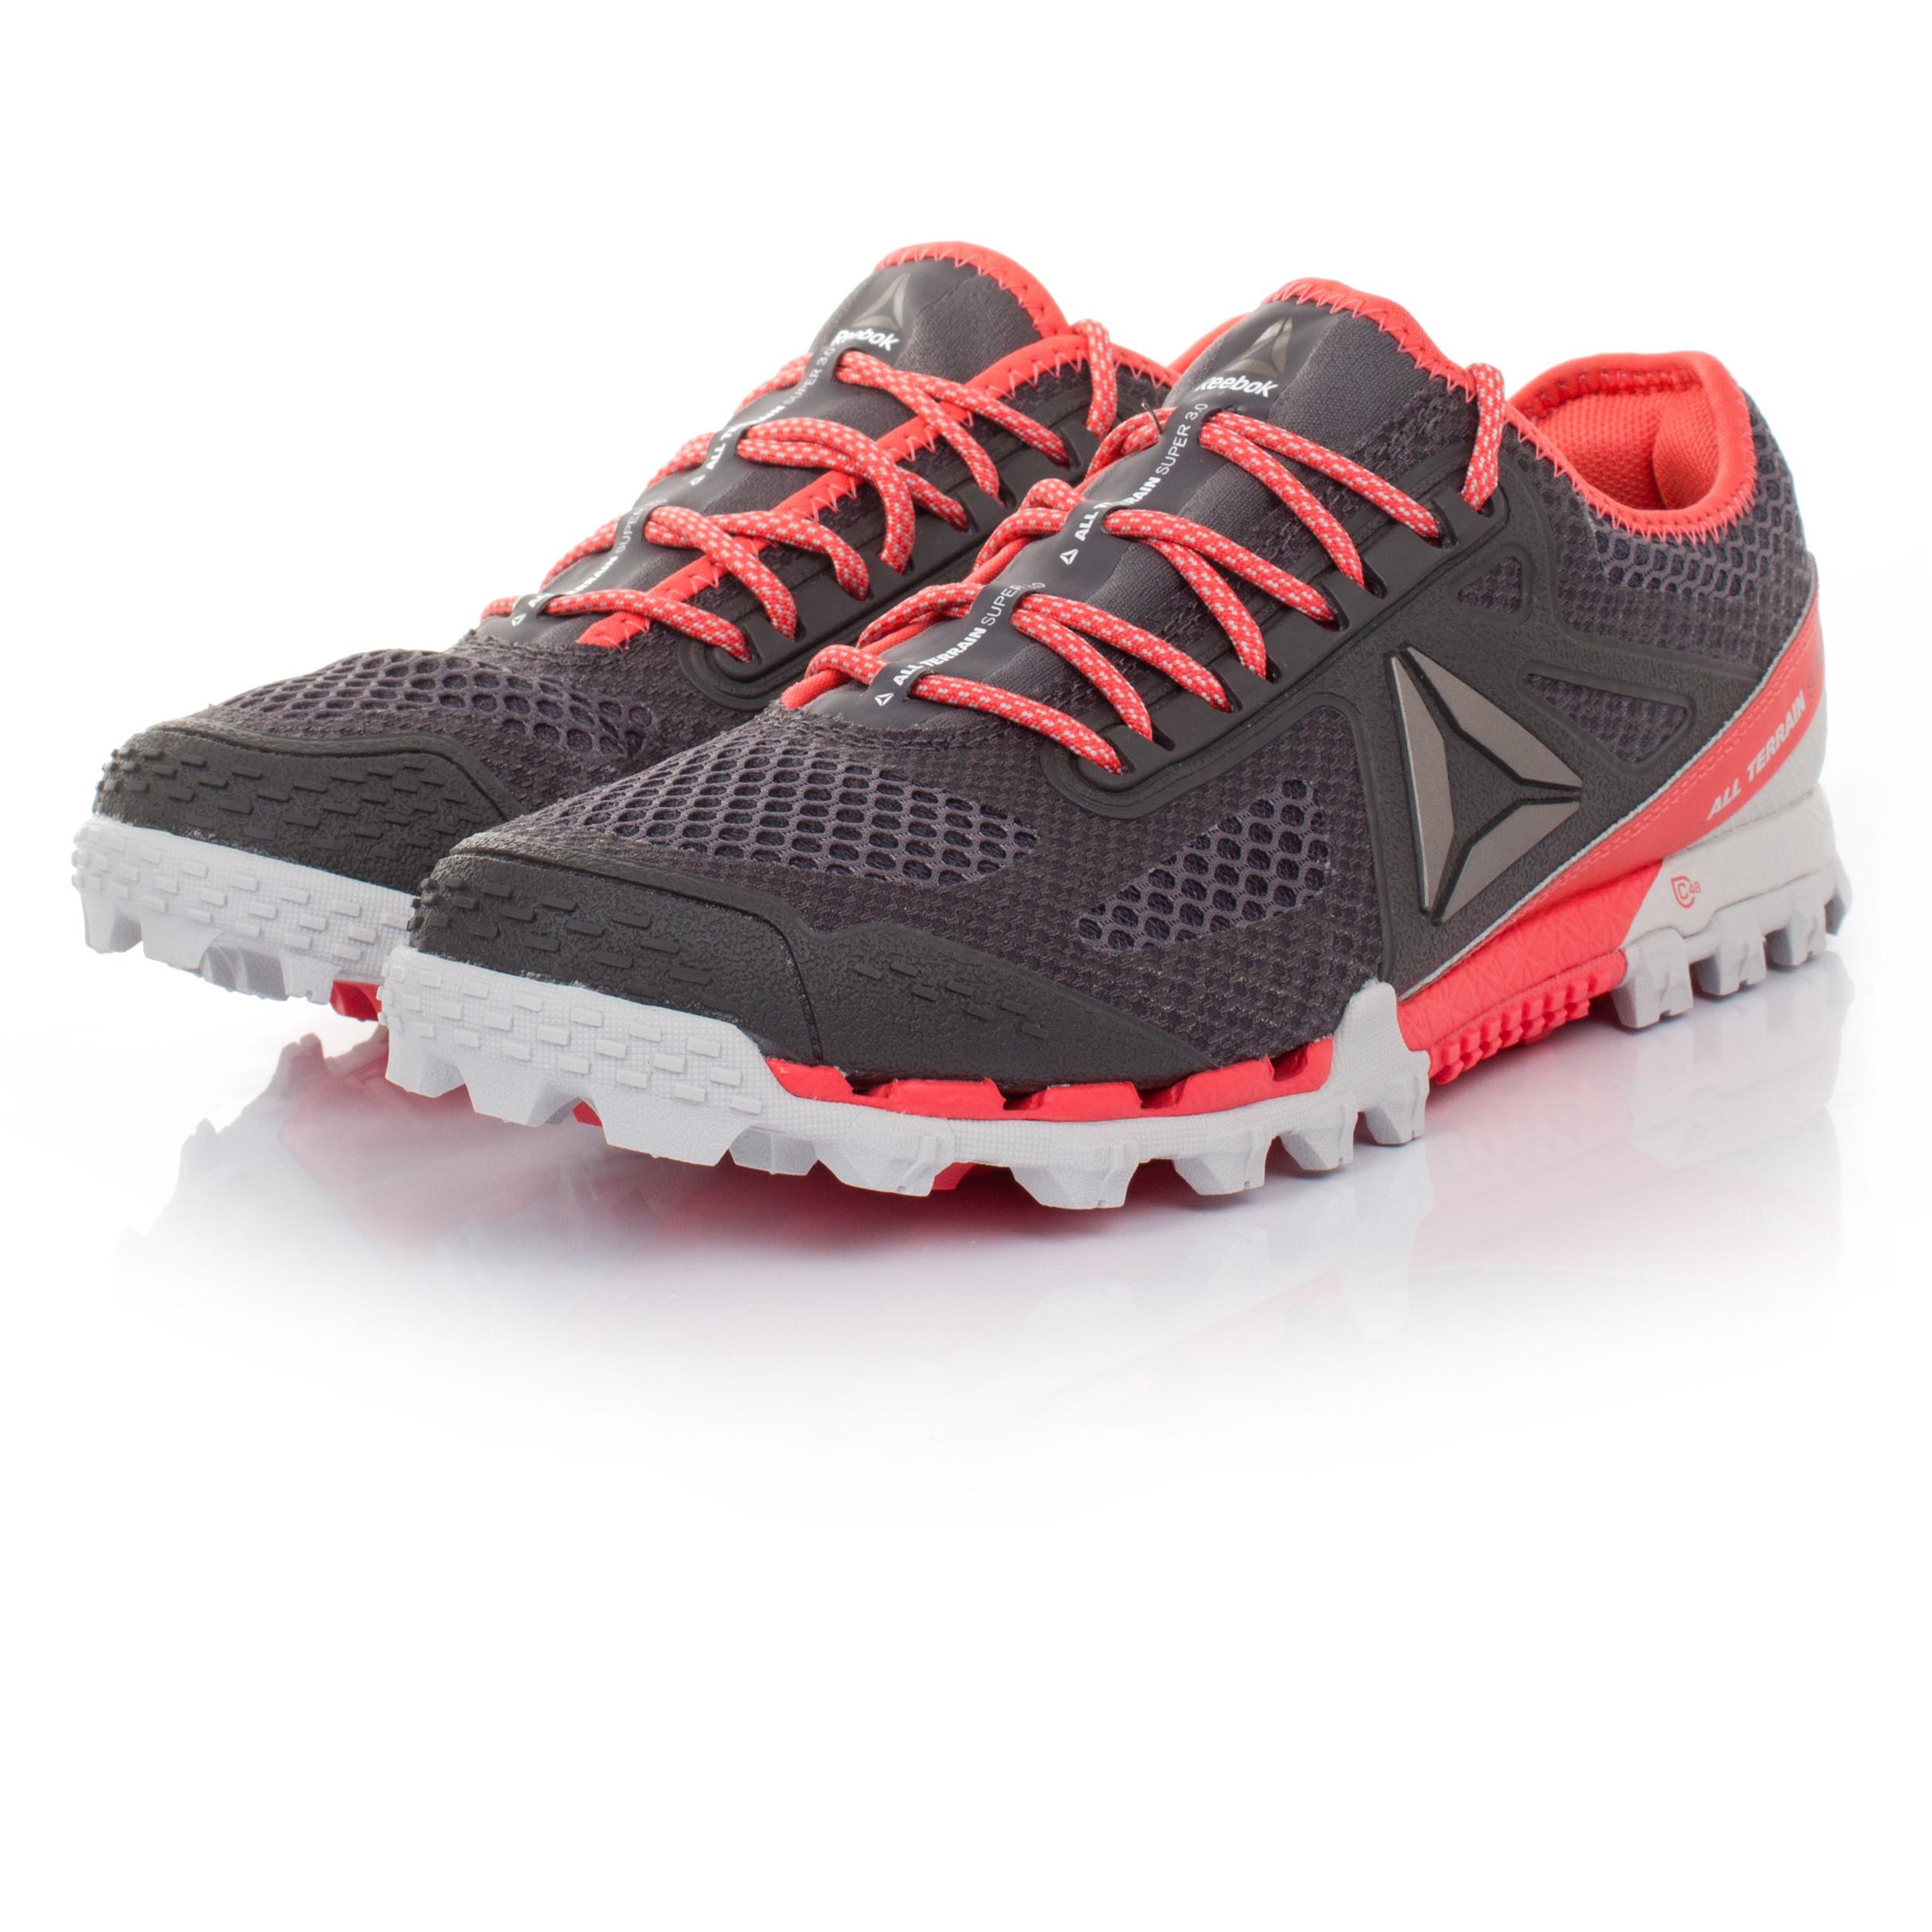 Purple And Black Reebok Running Shoes